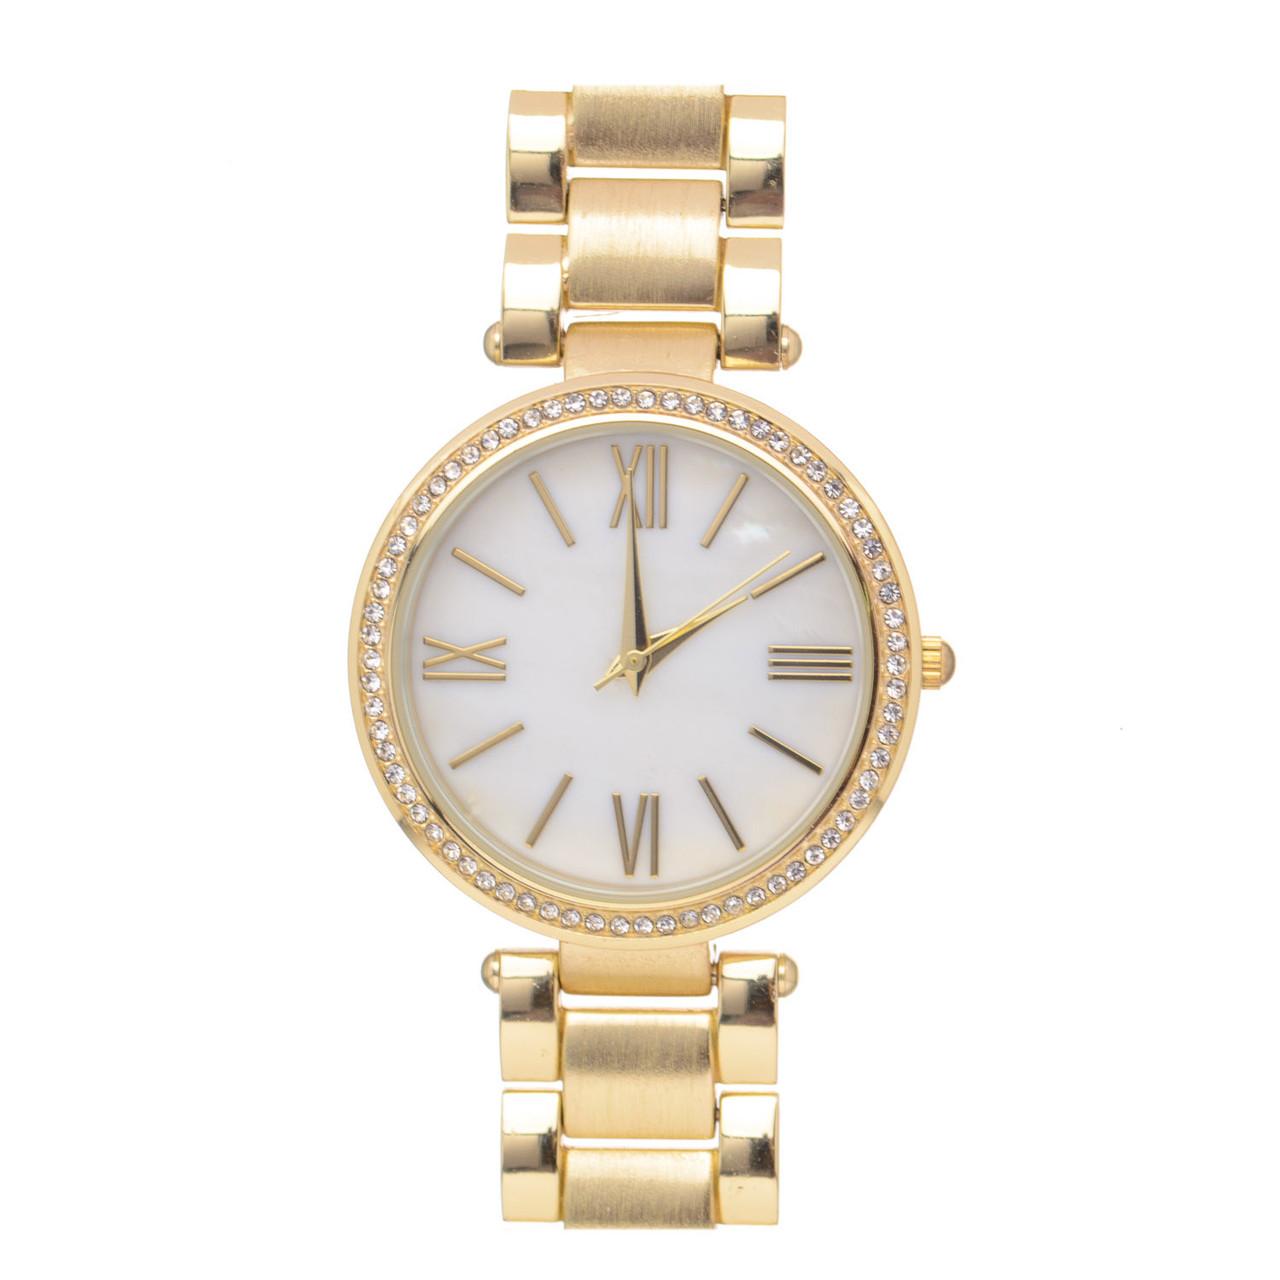 Жіночий годинник Anna Field ss18-02